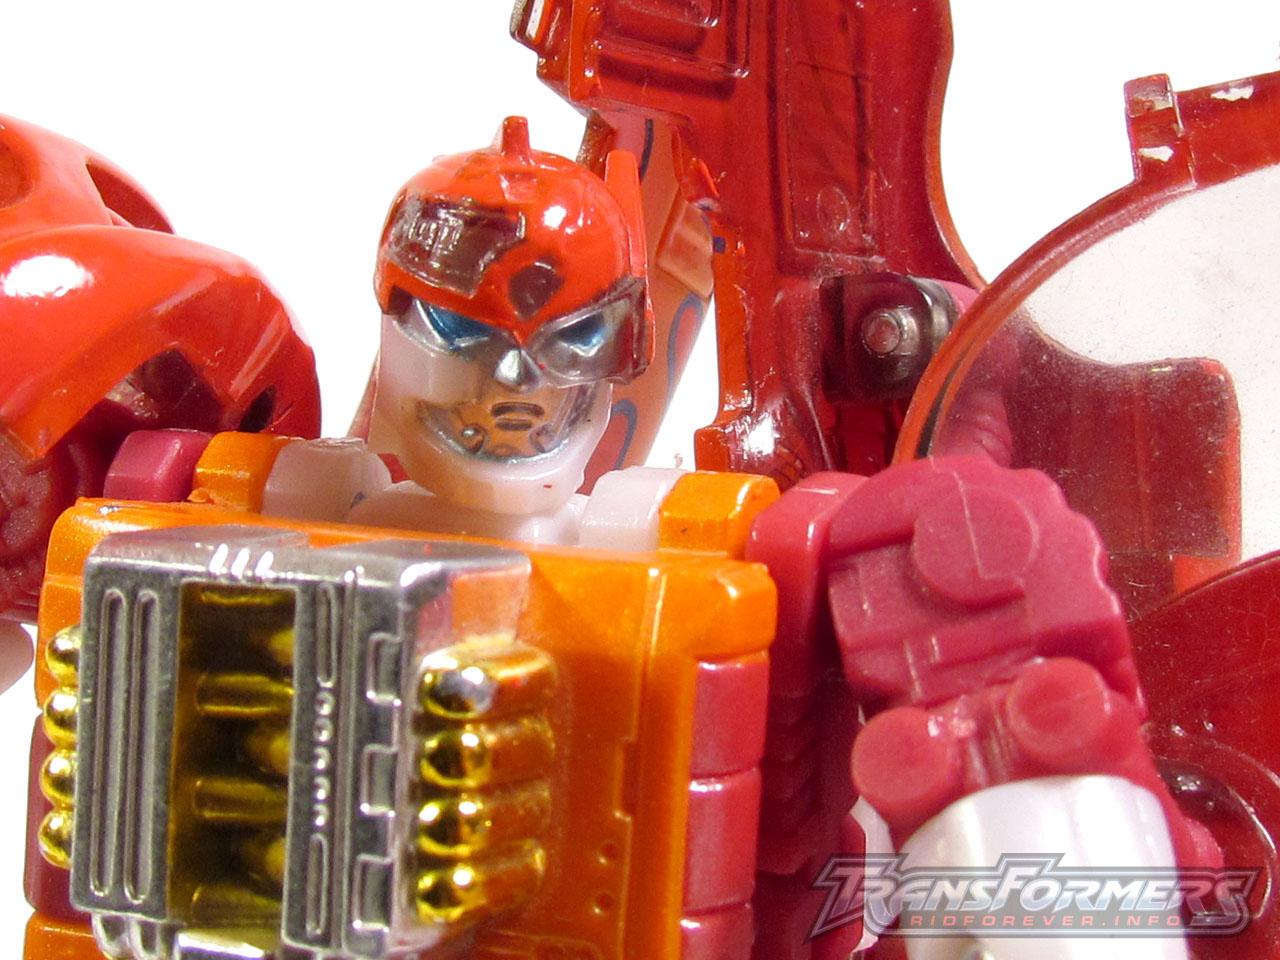 Sideburn Super 014